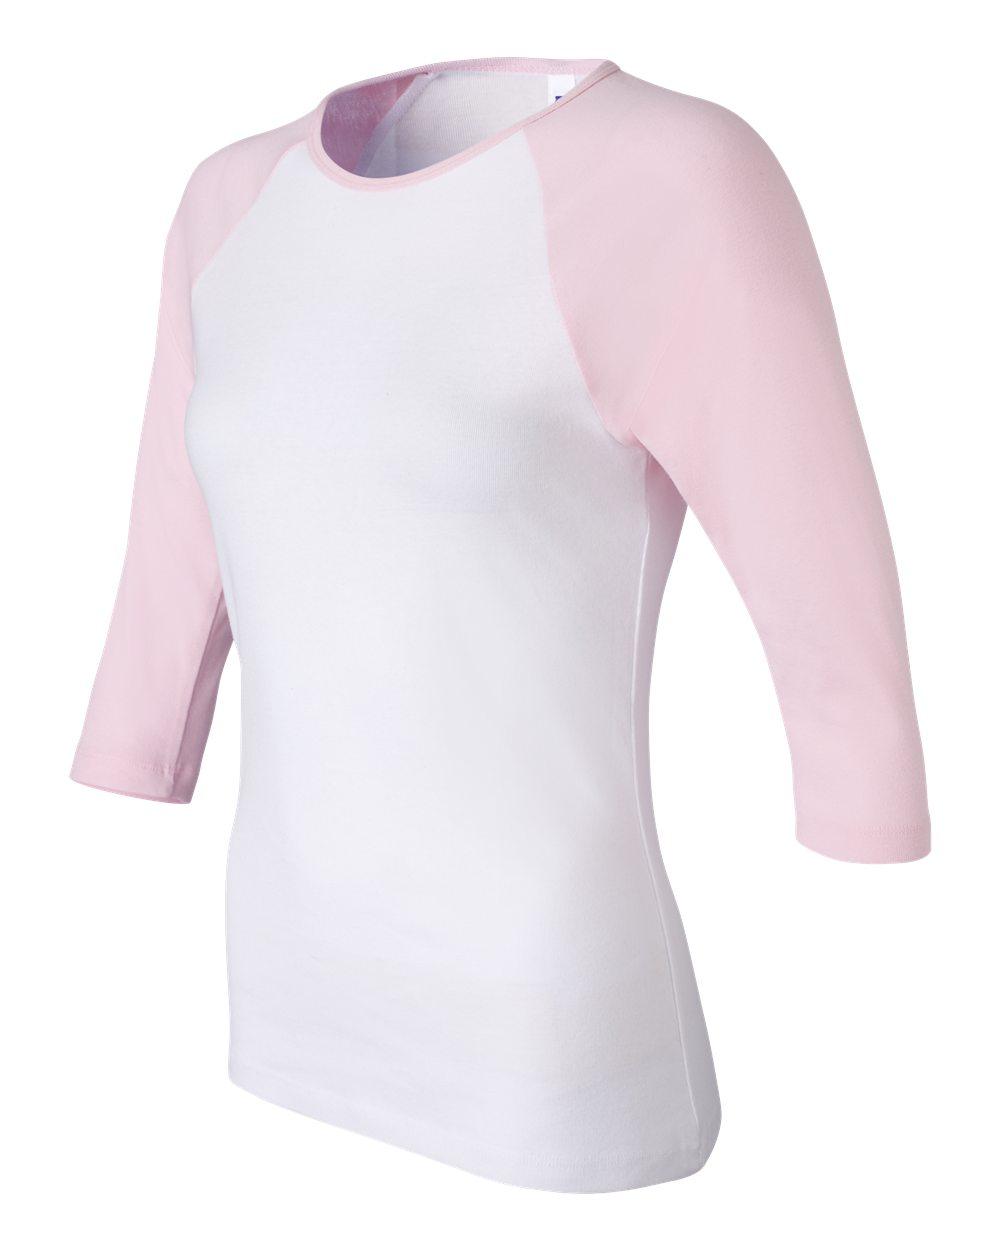 Bella-Canvas-Womens-Stretch-Rib-3-4-Sleeve-Contrast-Raglan-T-Shirt-B2000 thumbnail 22